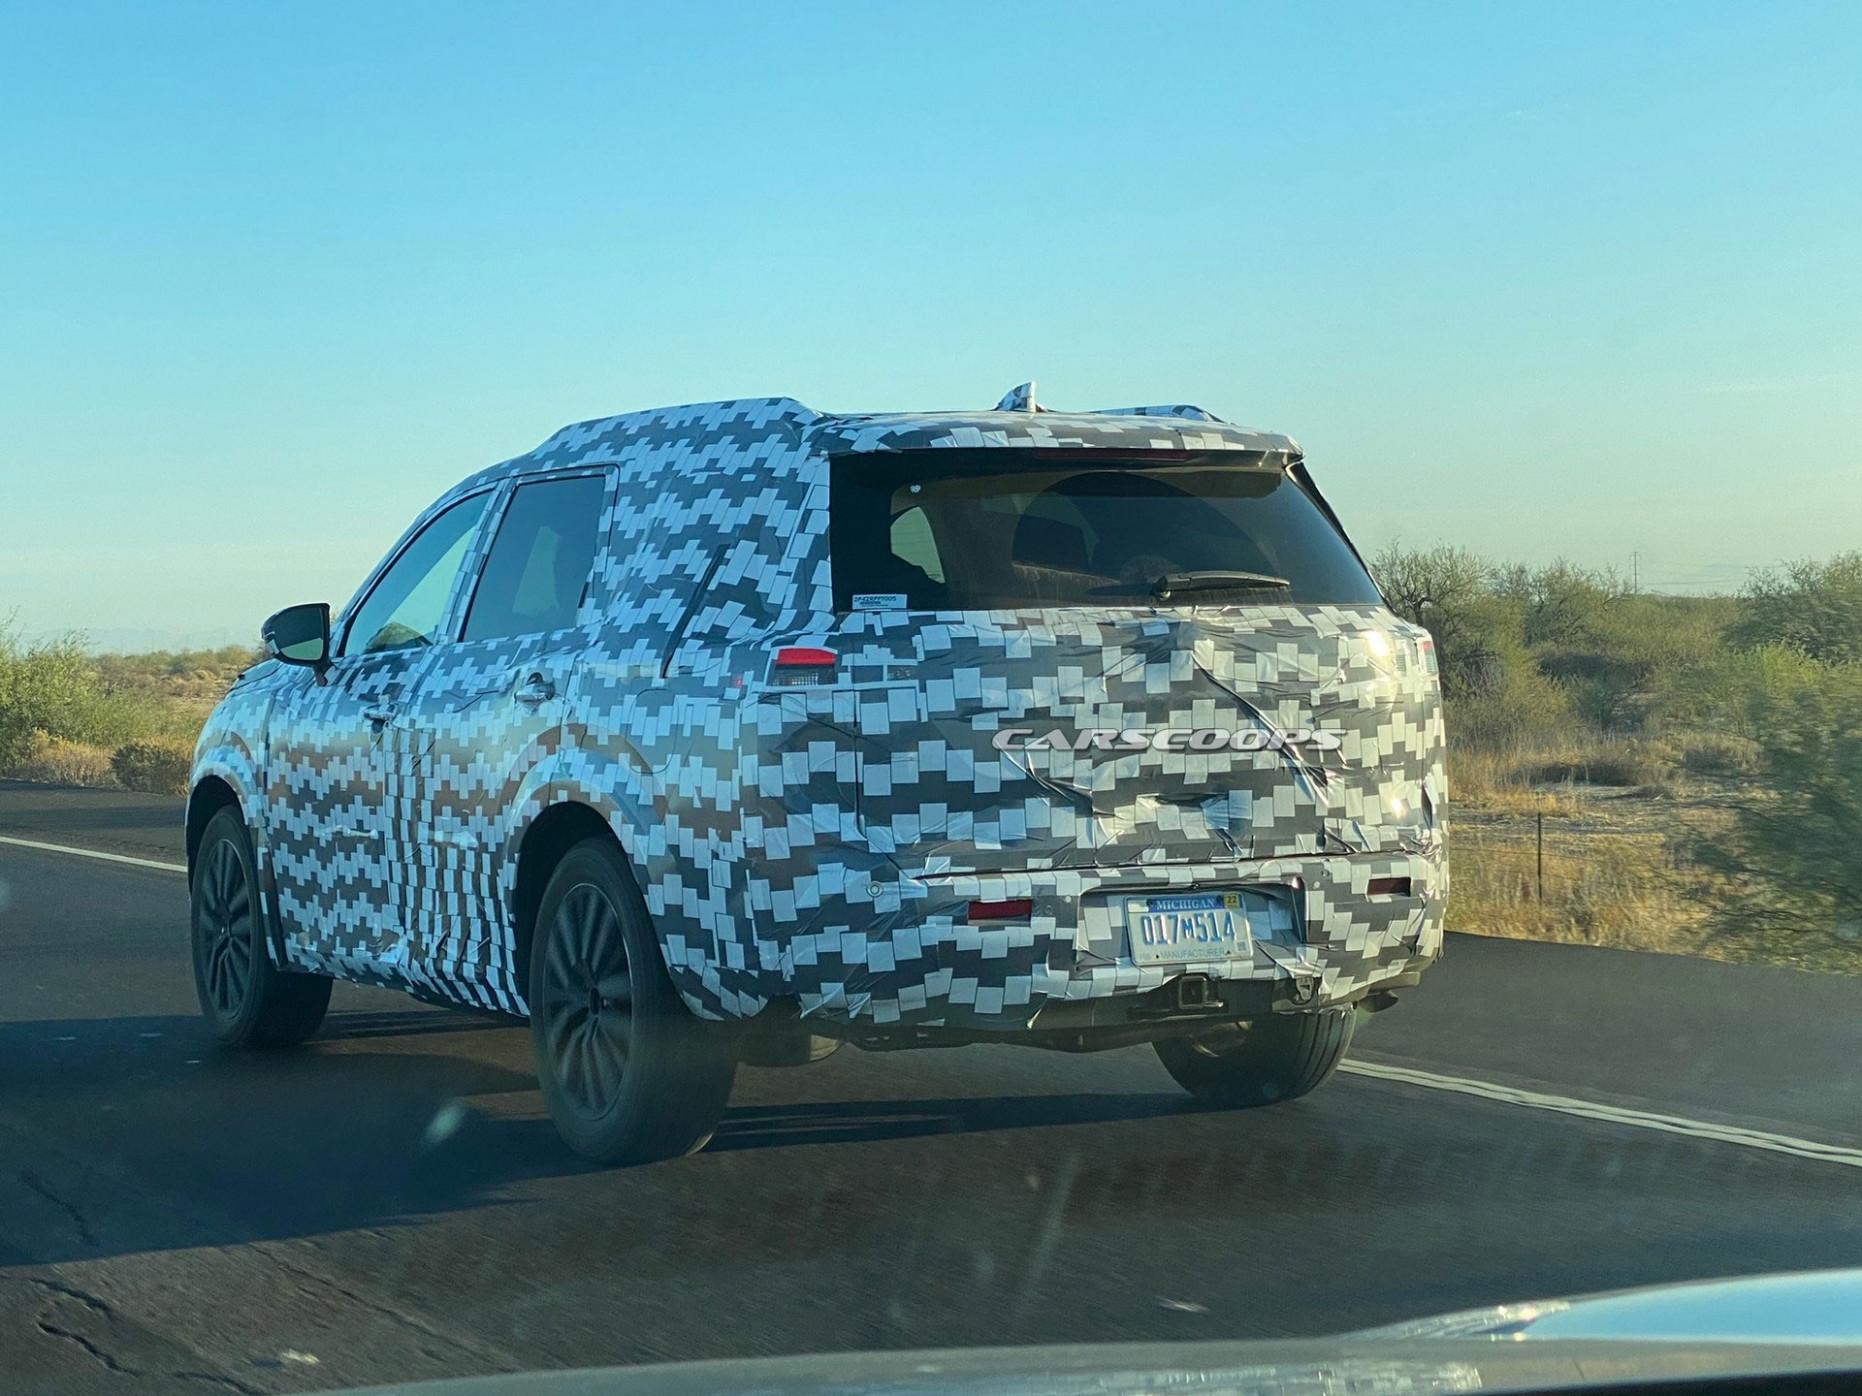 Picture 2022 Nissan Pathfinder